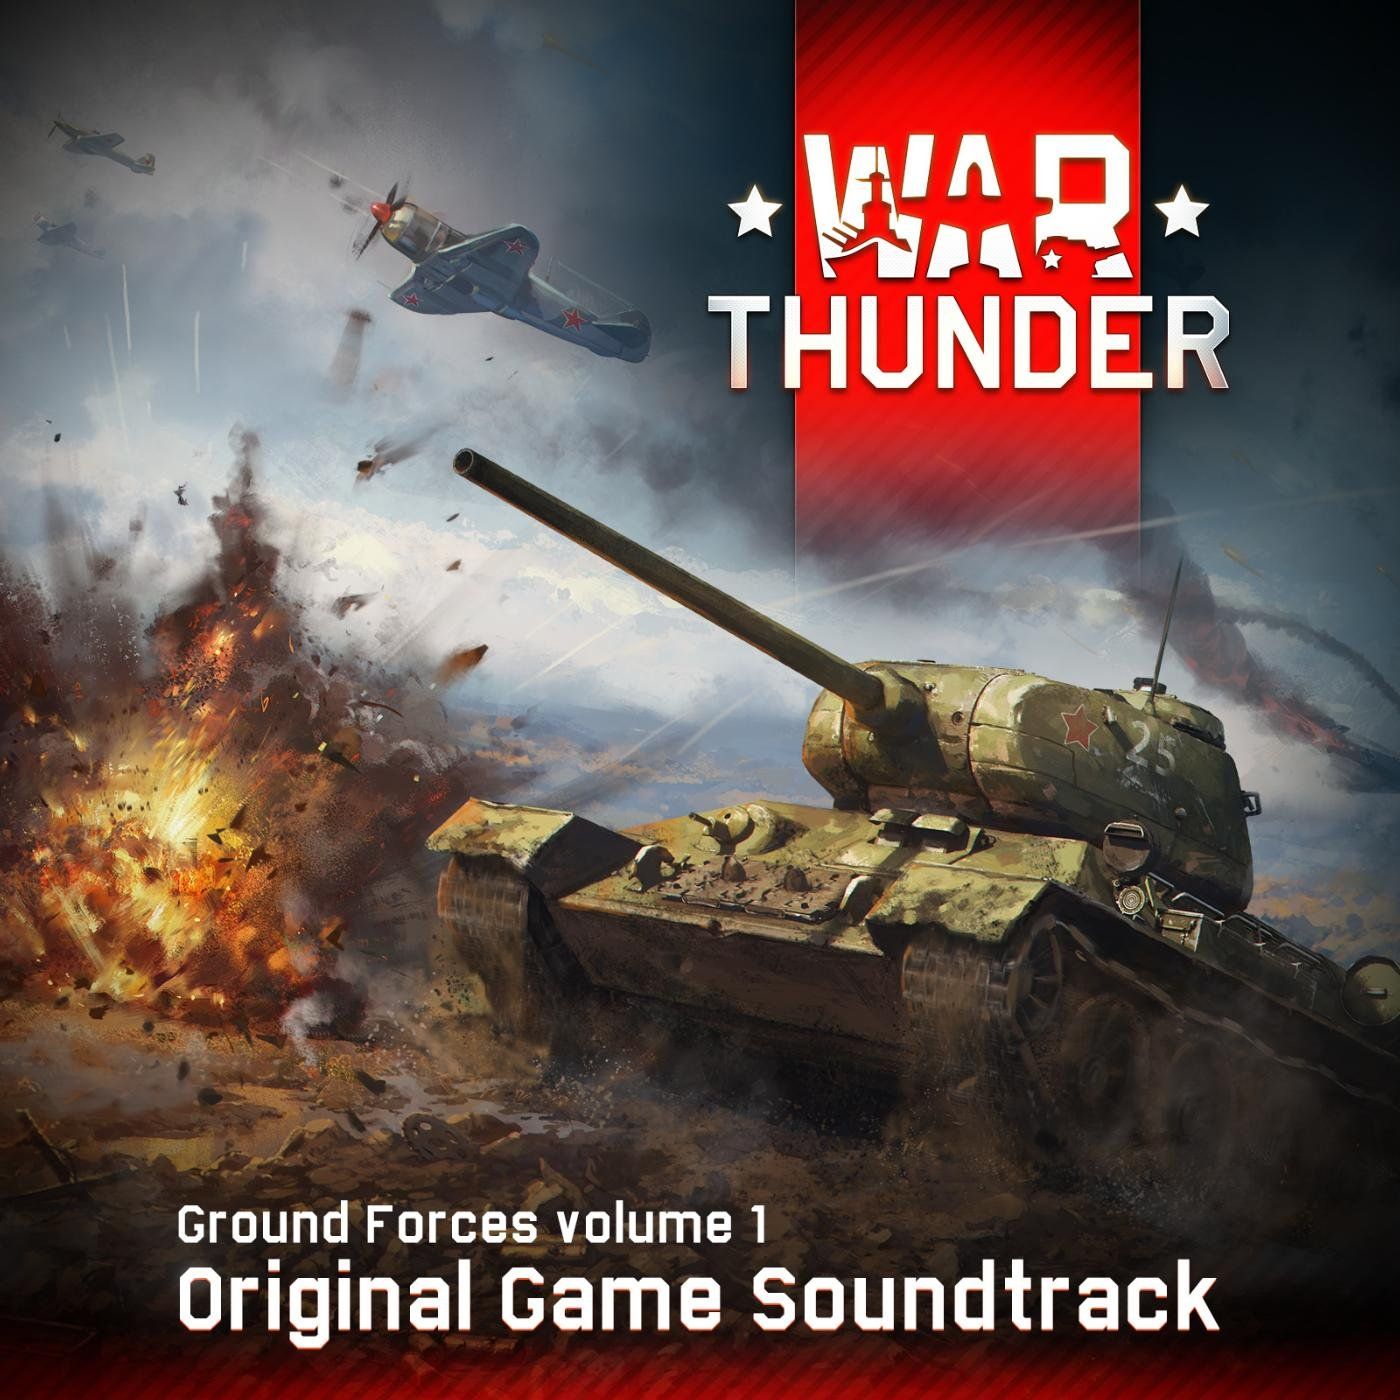 War_Thunder_Original_Game_Soundtrack-Ground_Forces_volume_1__cover1200x1200.jpg